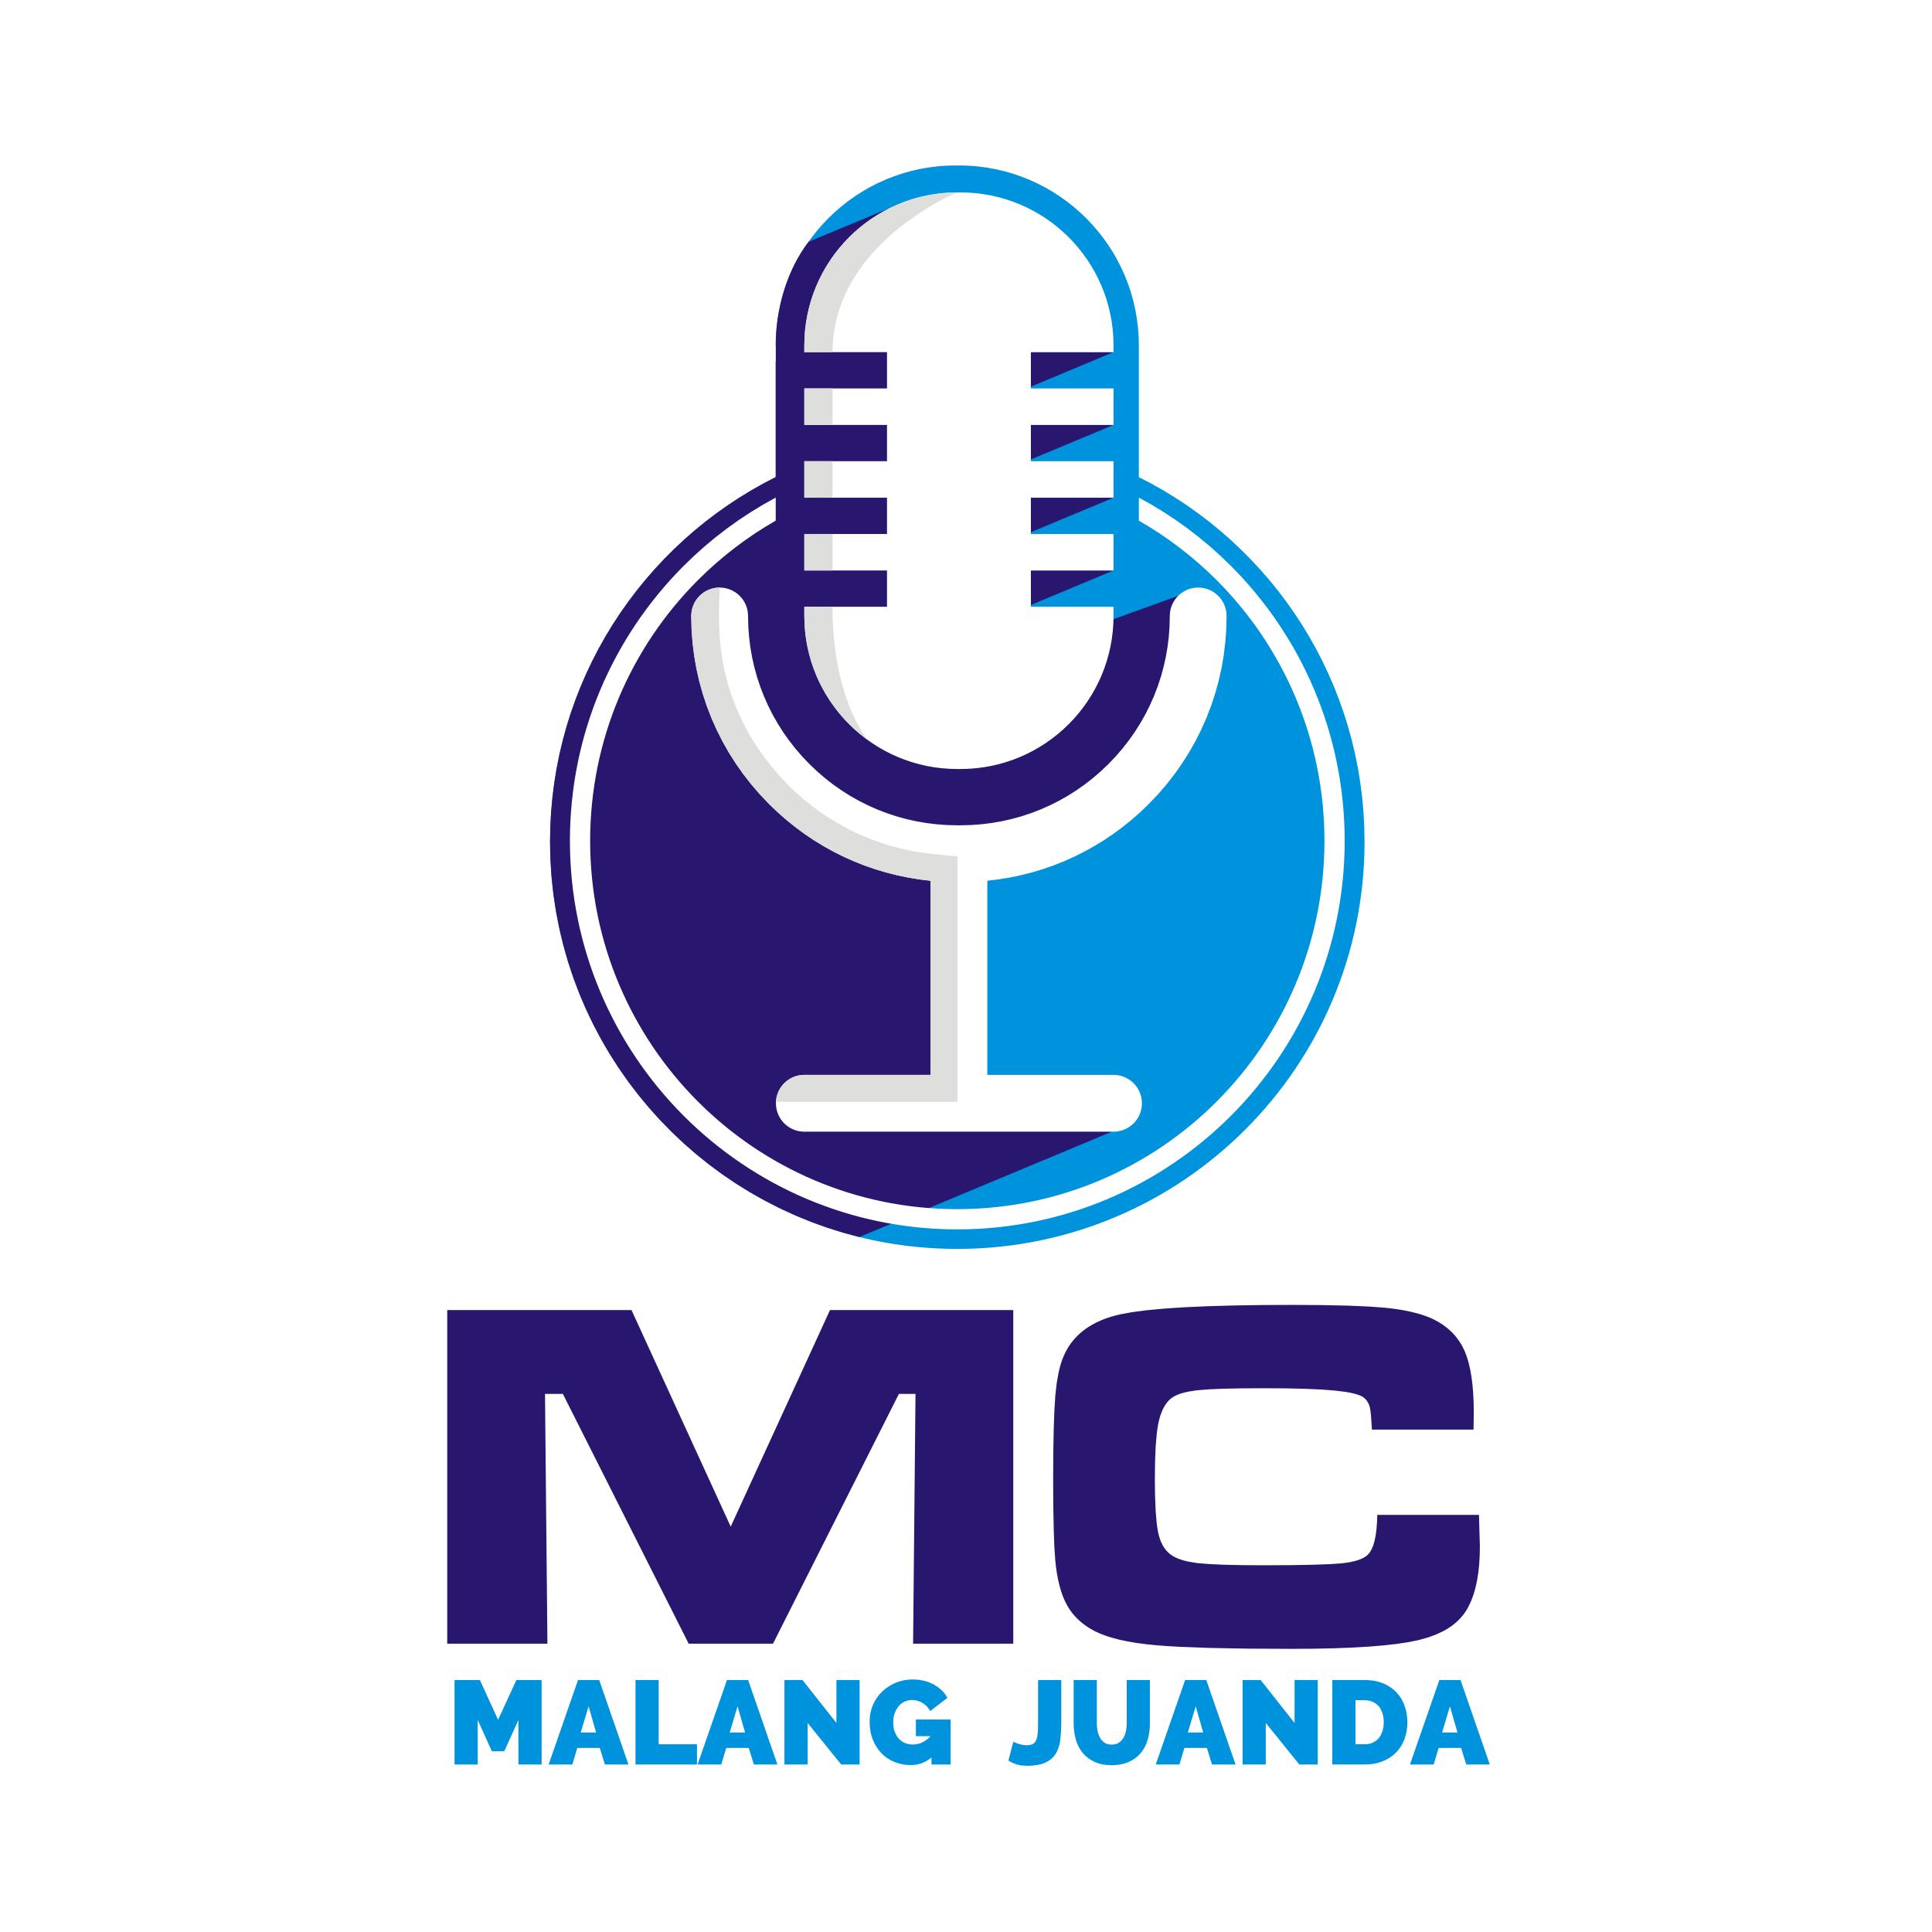 Jasa MC Malang Surabaya | MCMalangJuanda.com